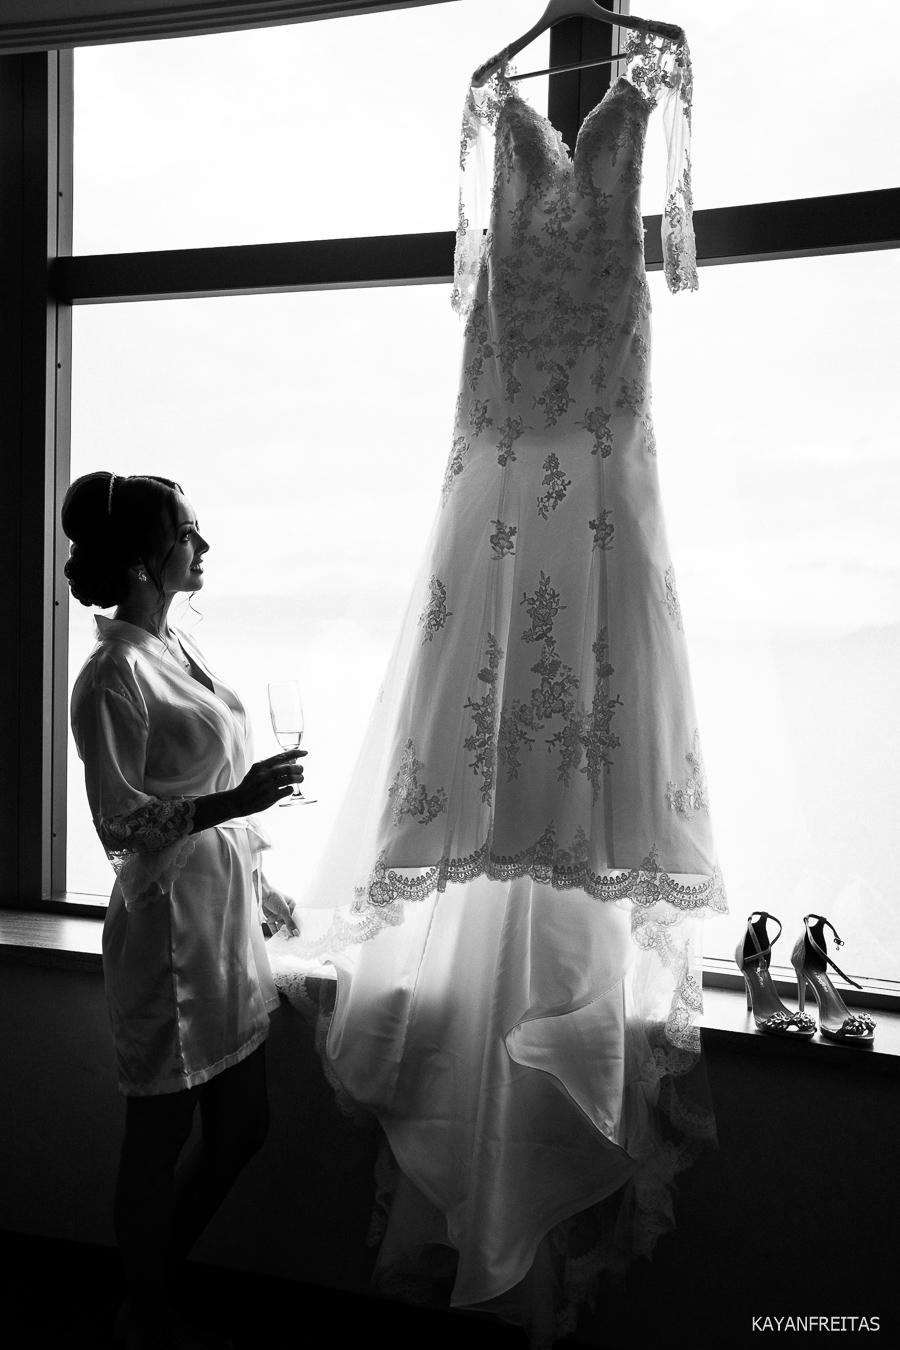 casamento-indaia-floripa-0014 Casamento Indaiá Florianópolis - Deise e Dário